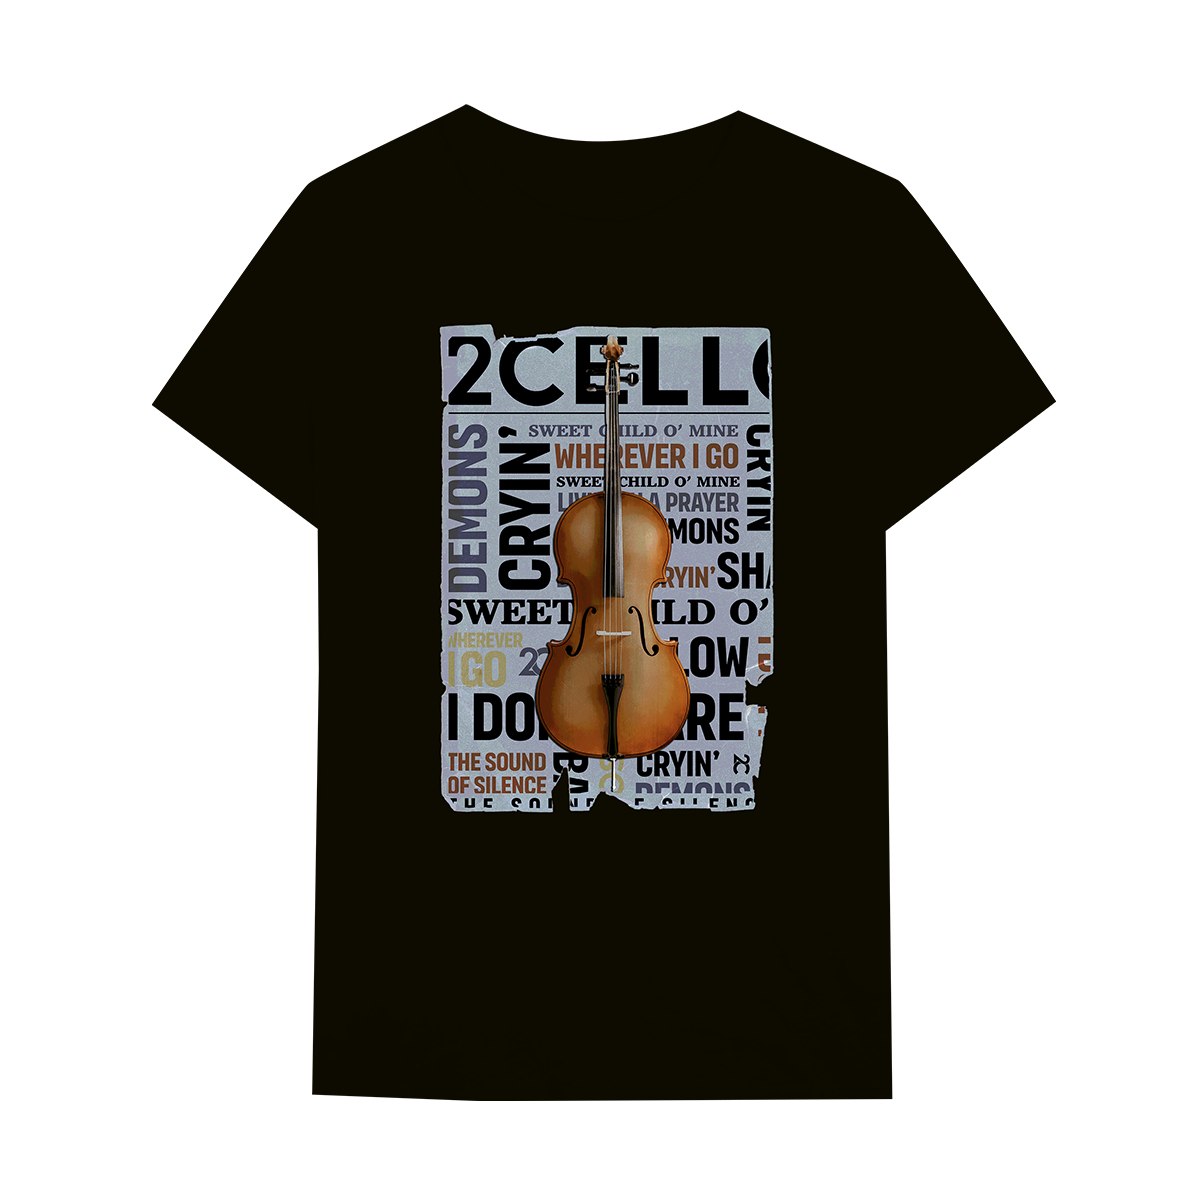 Buy Online 2 Cellos - 2CELLOS Cello Newspaper Black T-Shirt